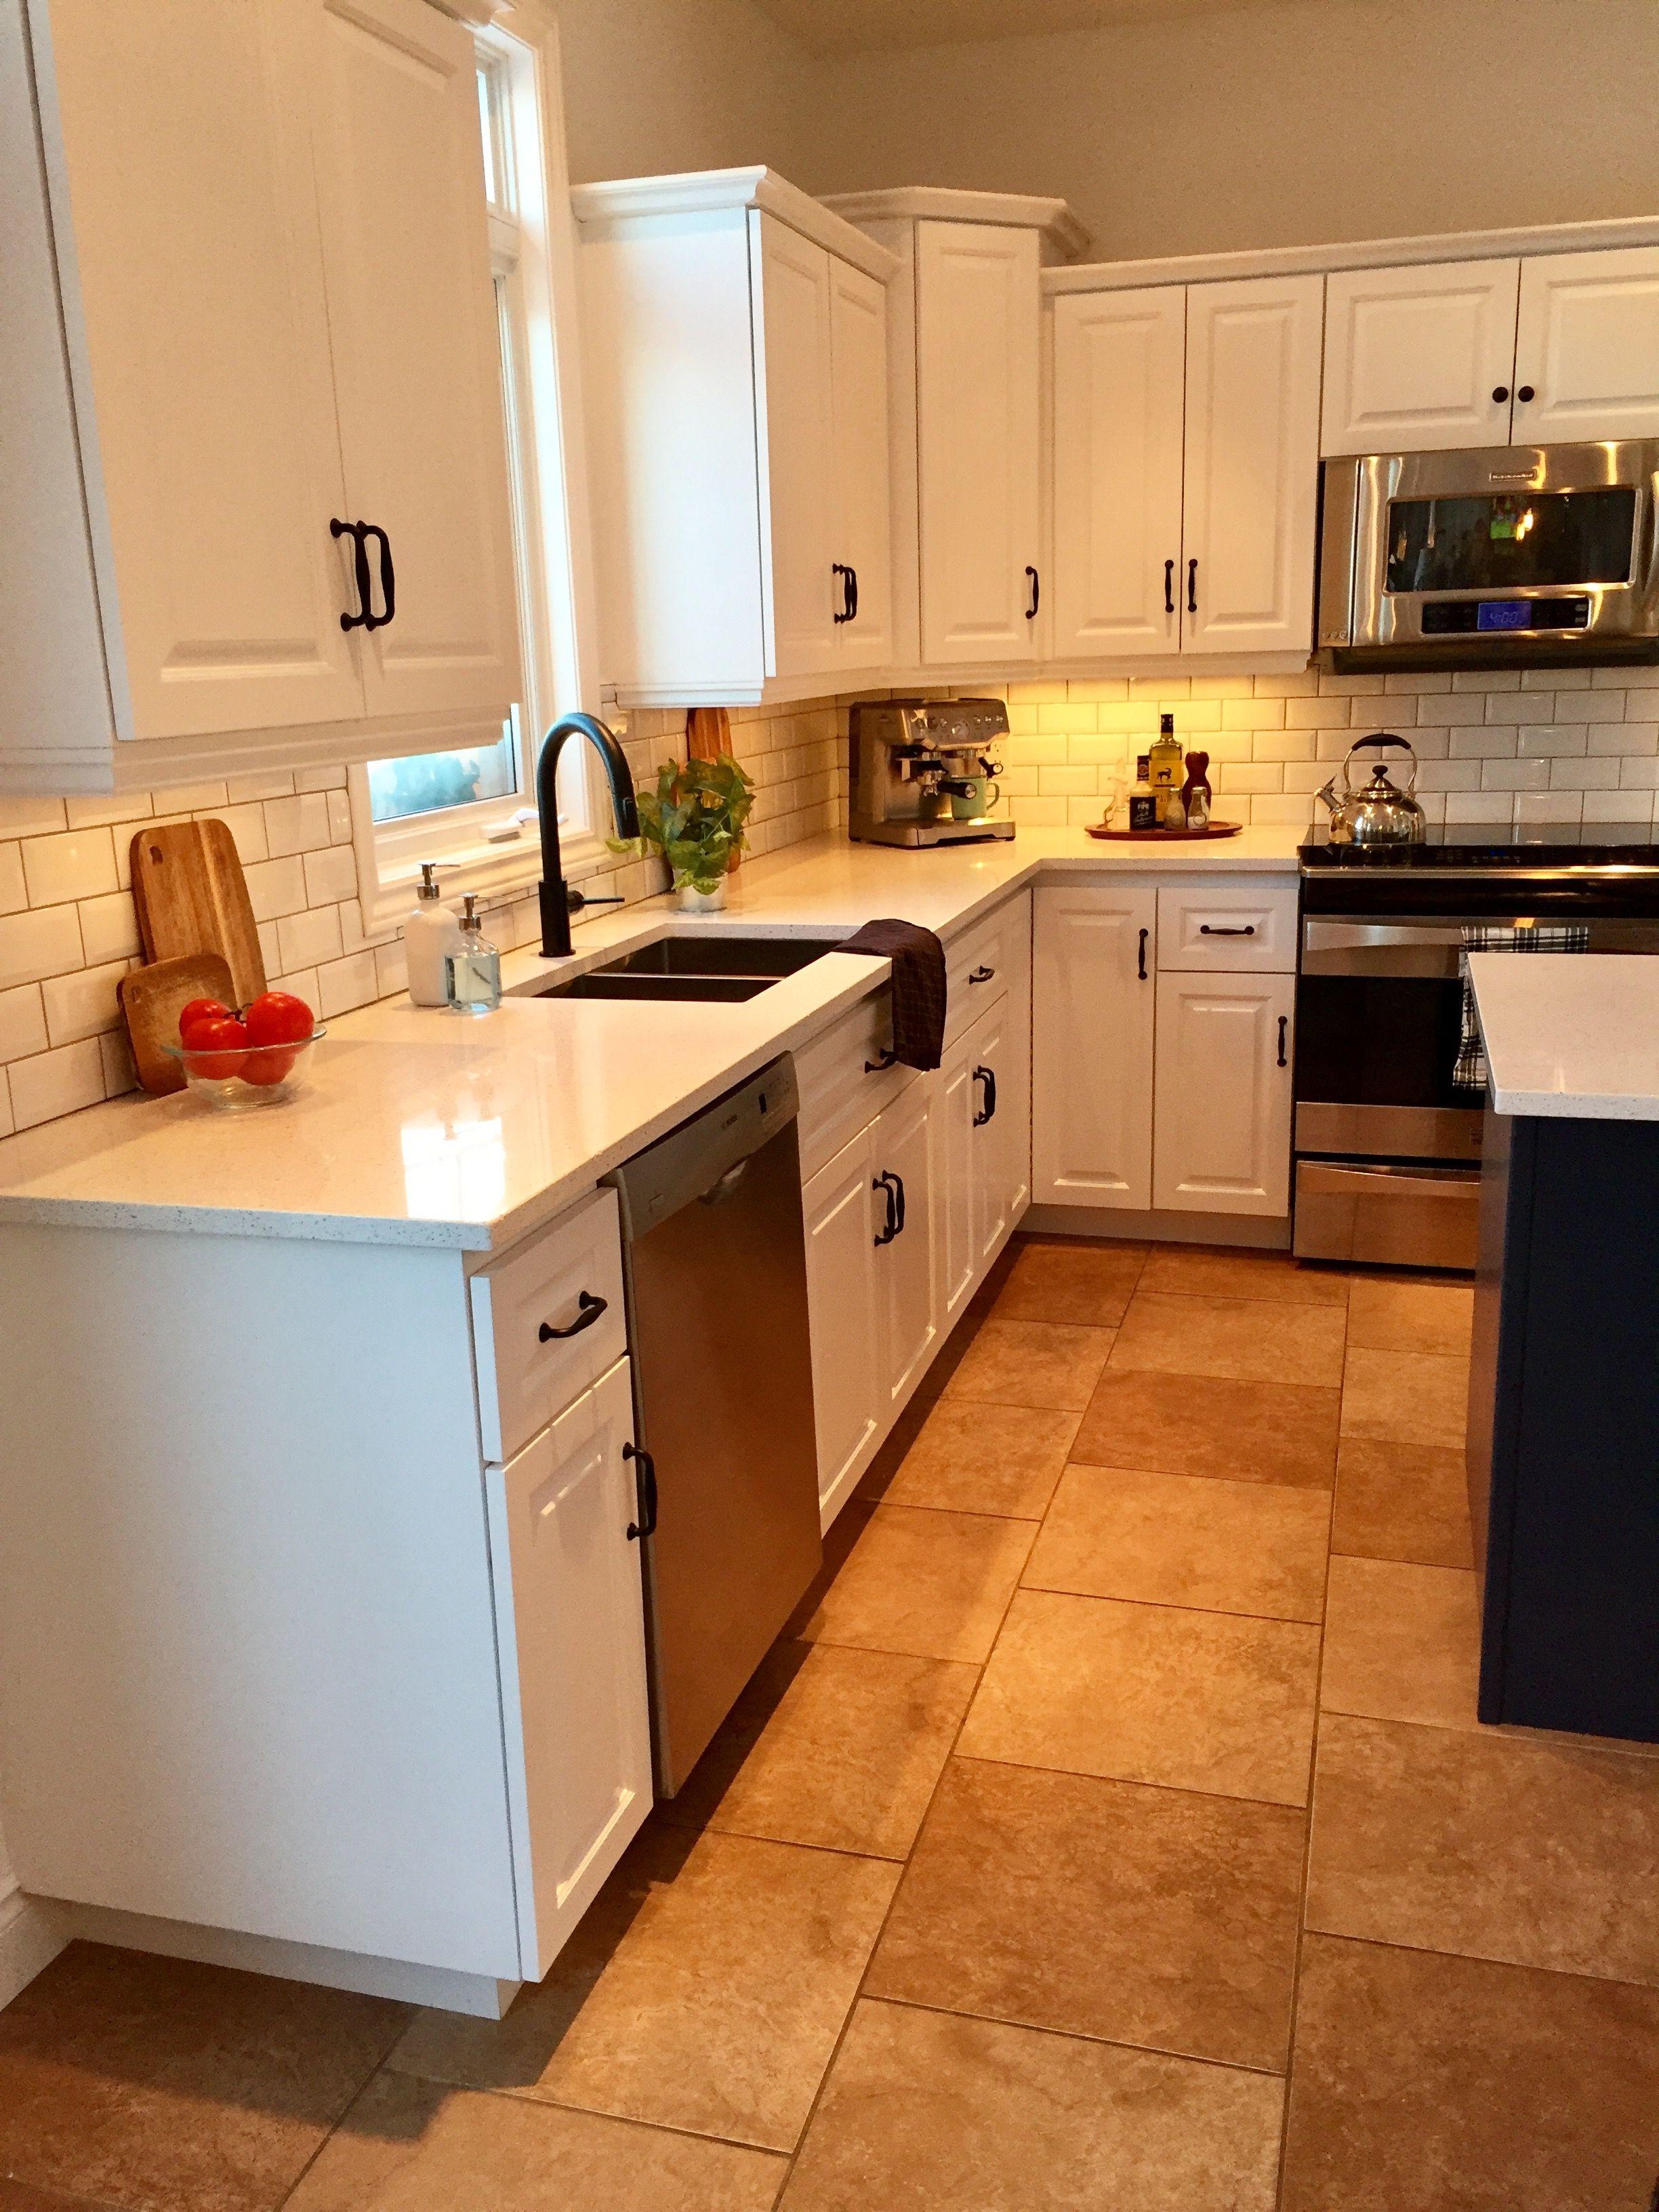 Best Hale Navy Island Quartz Counters Chantilly Lace Cabinets 640 x 480